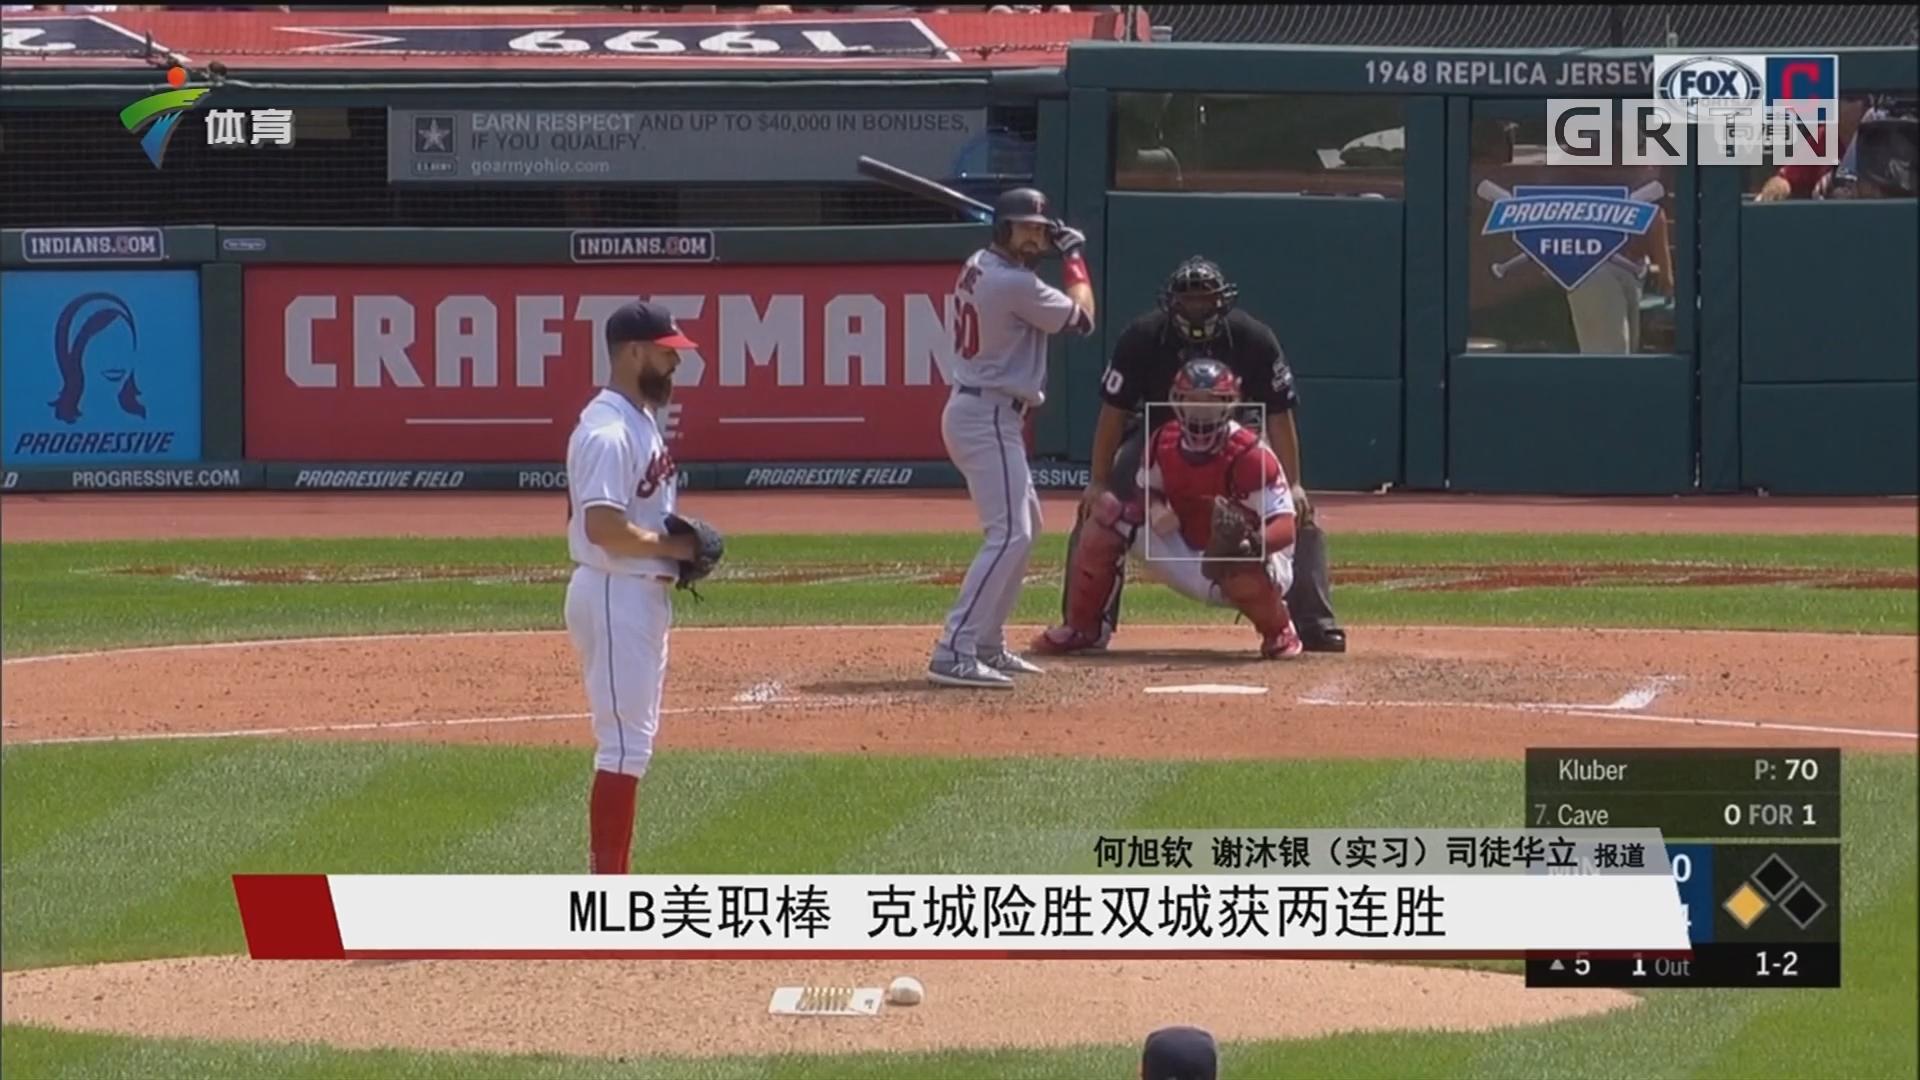 MLB美职棒 克城险胜双城获两连胜